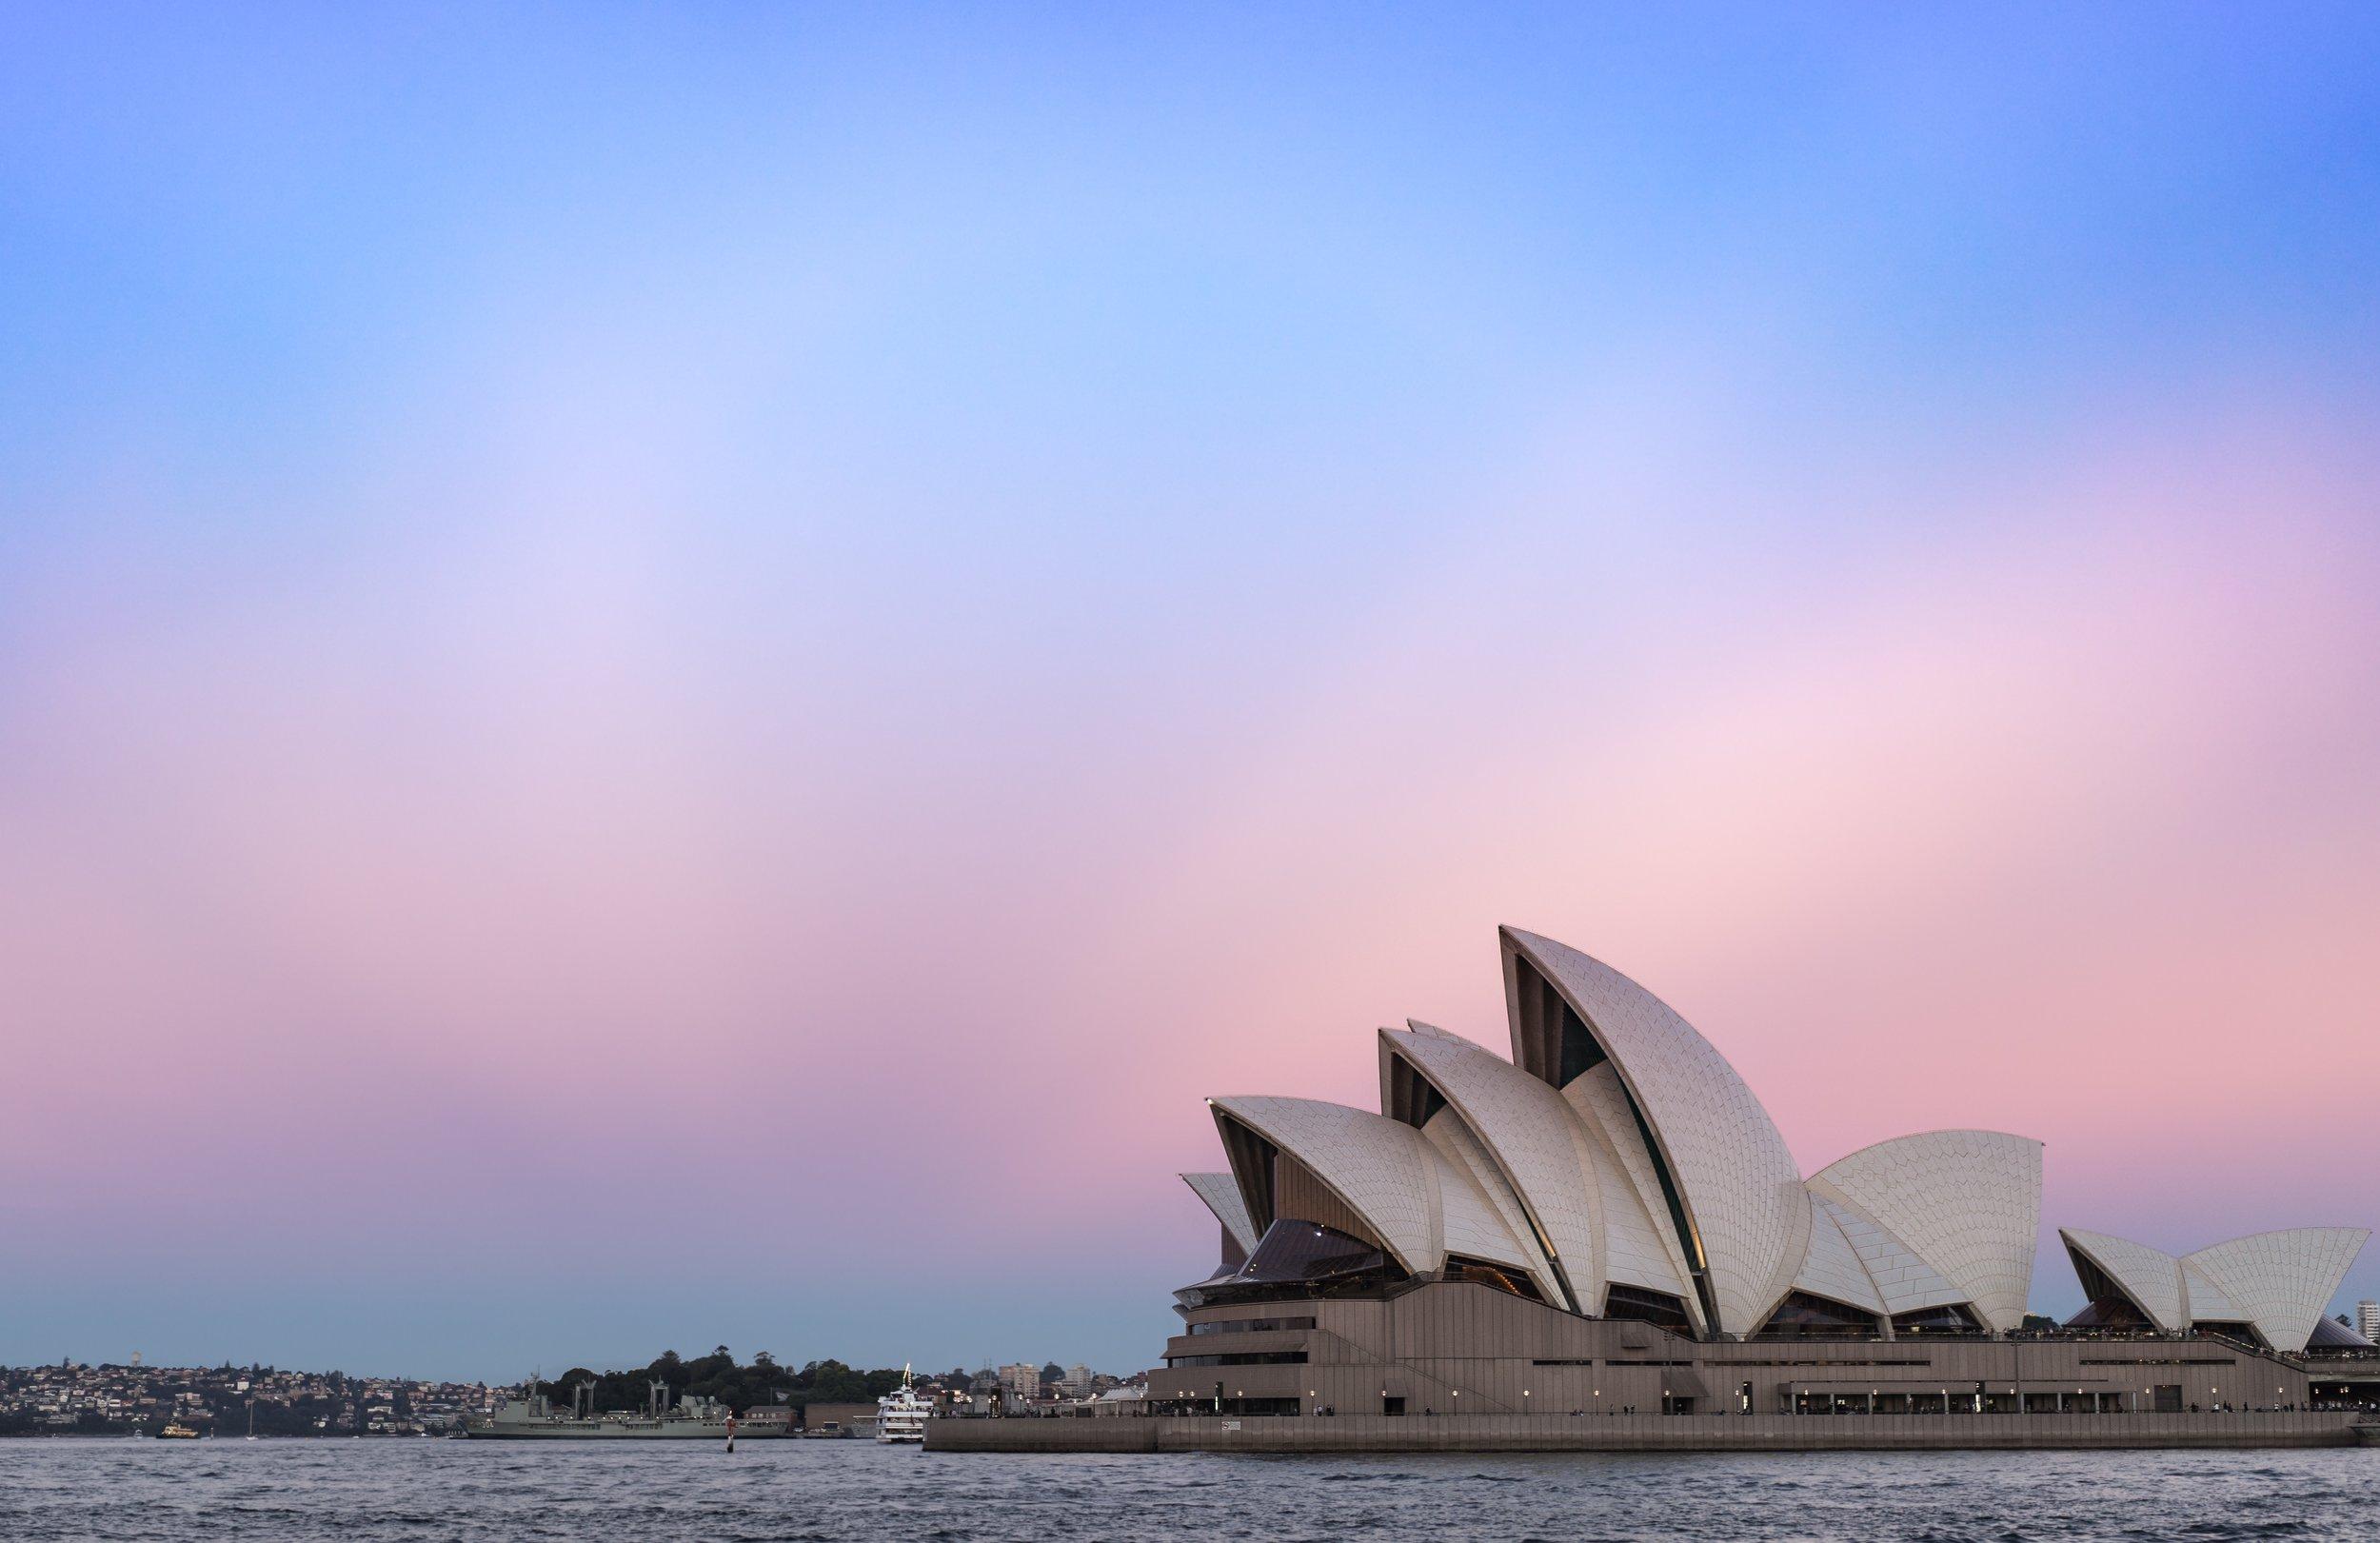 Australia by @johnny-bhalla